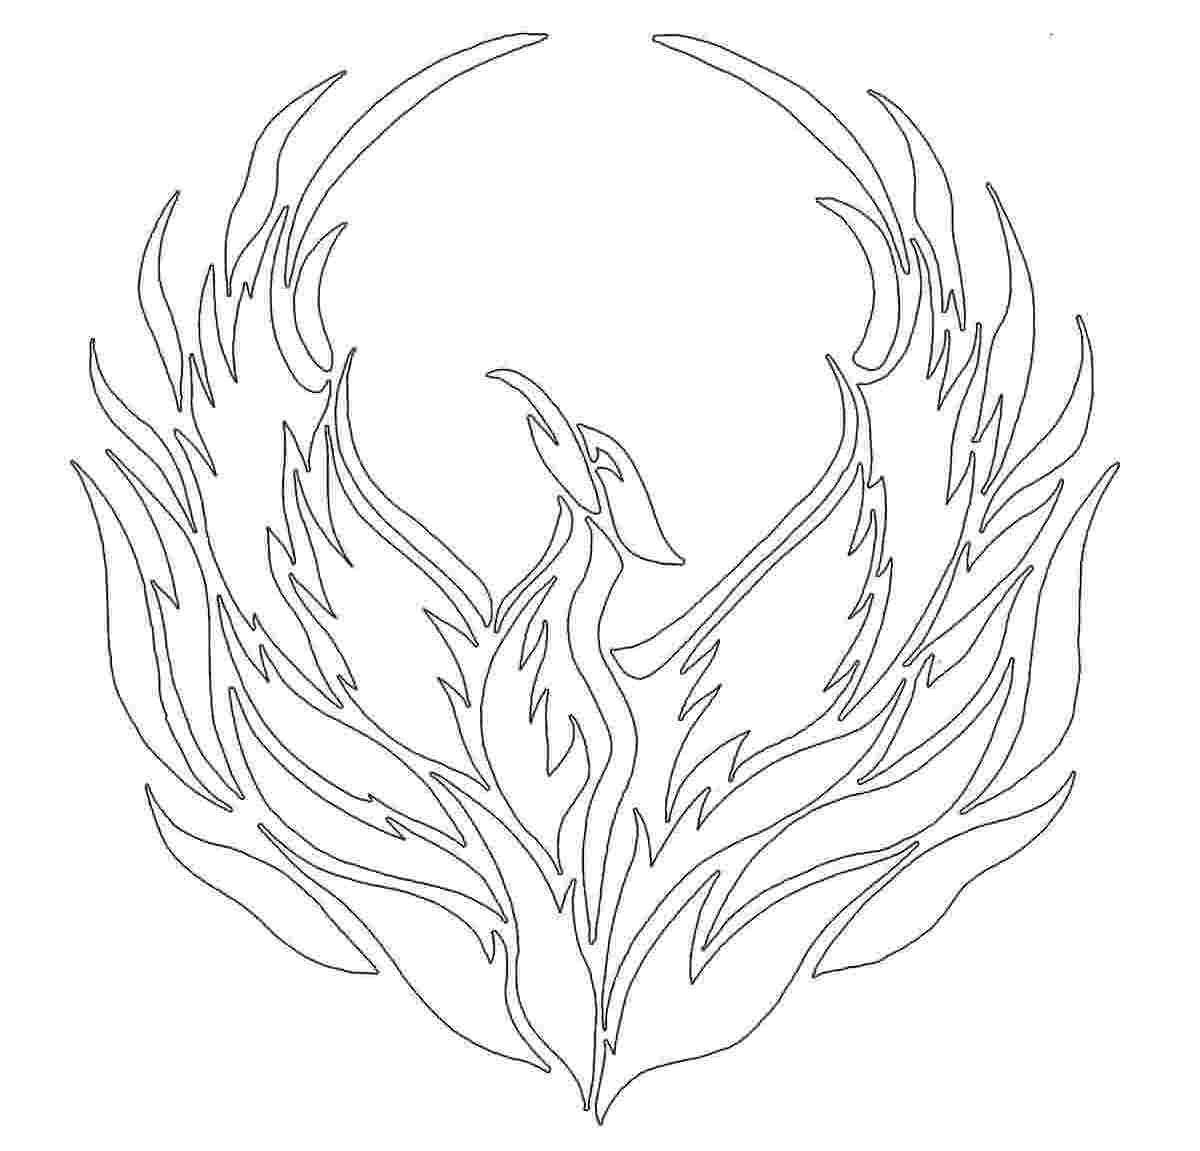 phoenix outline - Google Search   Body mods   Pinterest   Phoenix ...